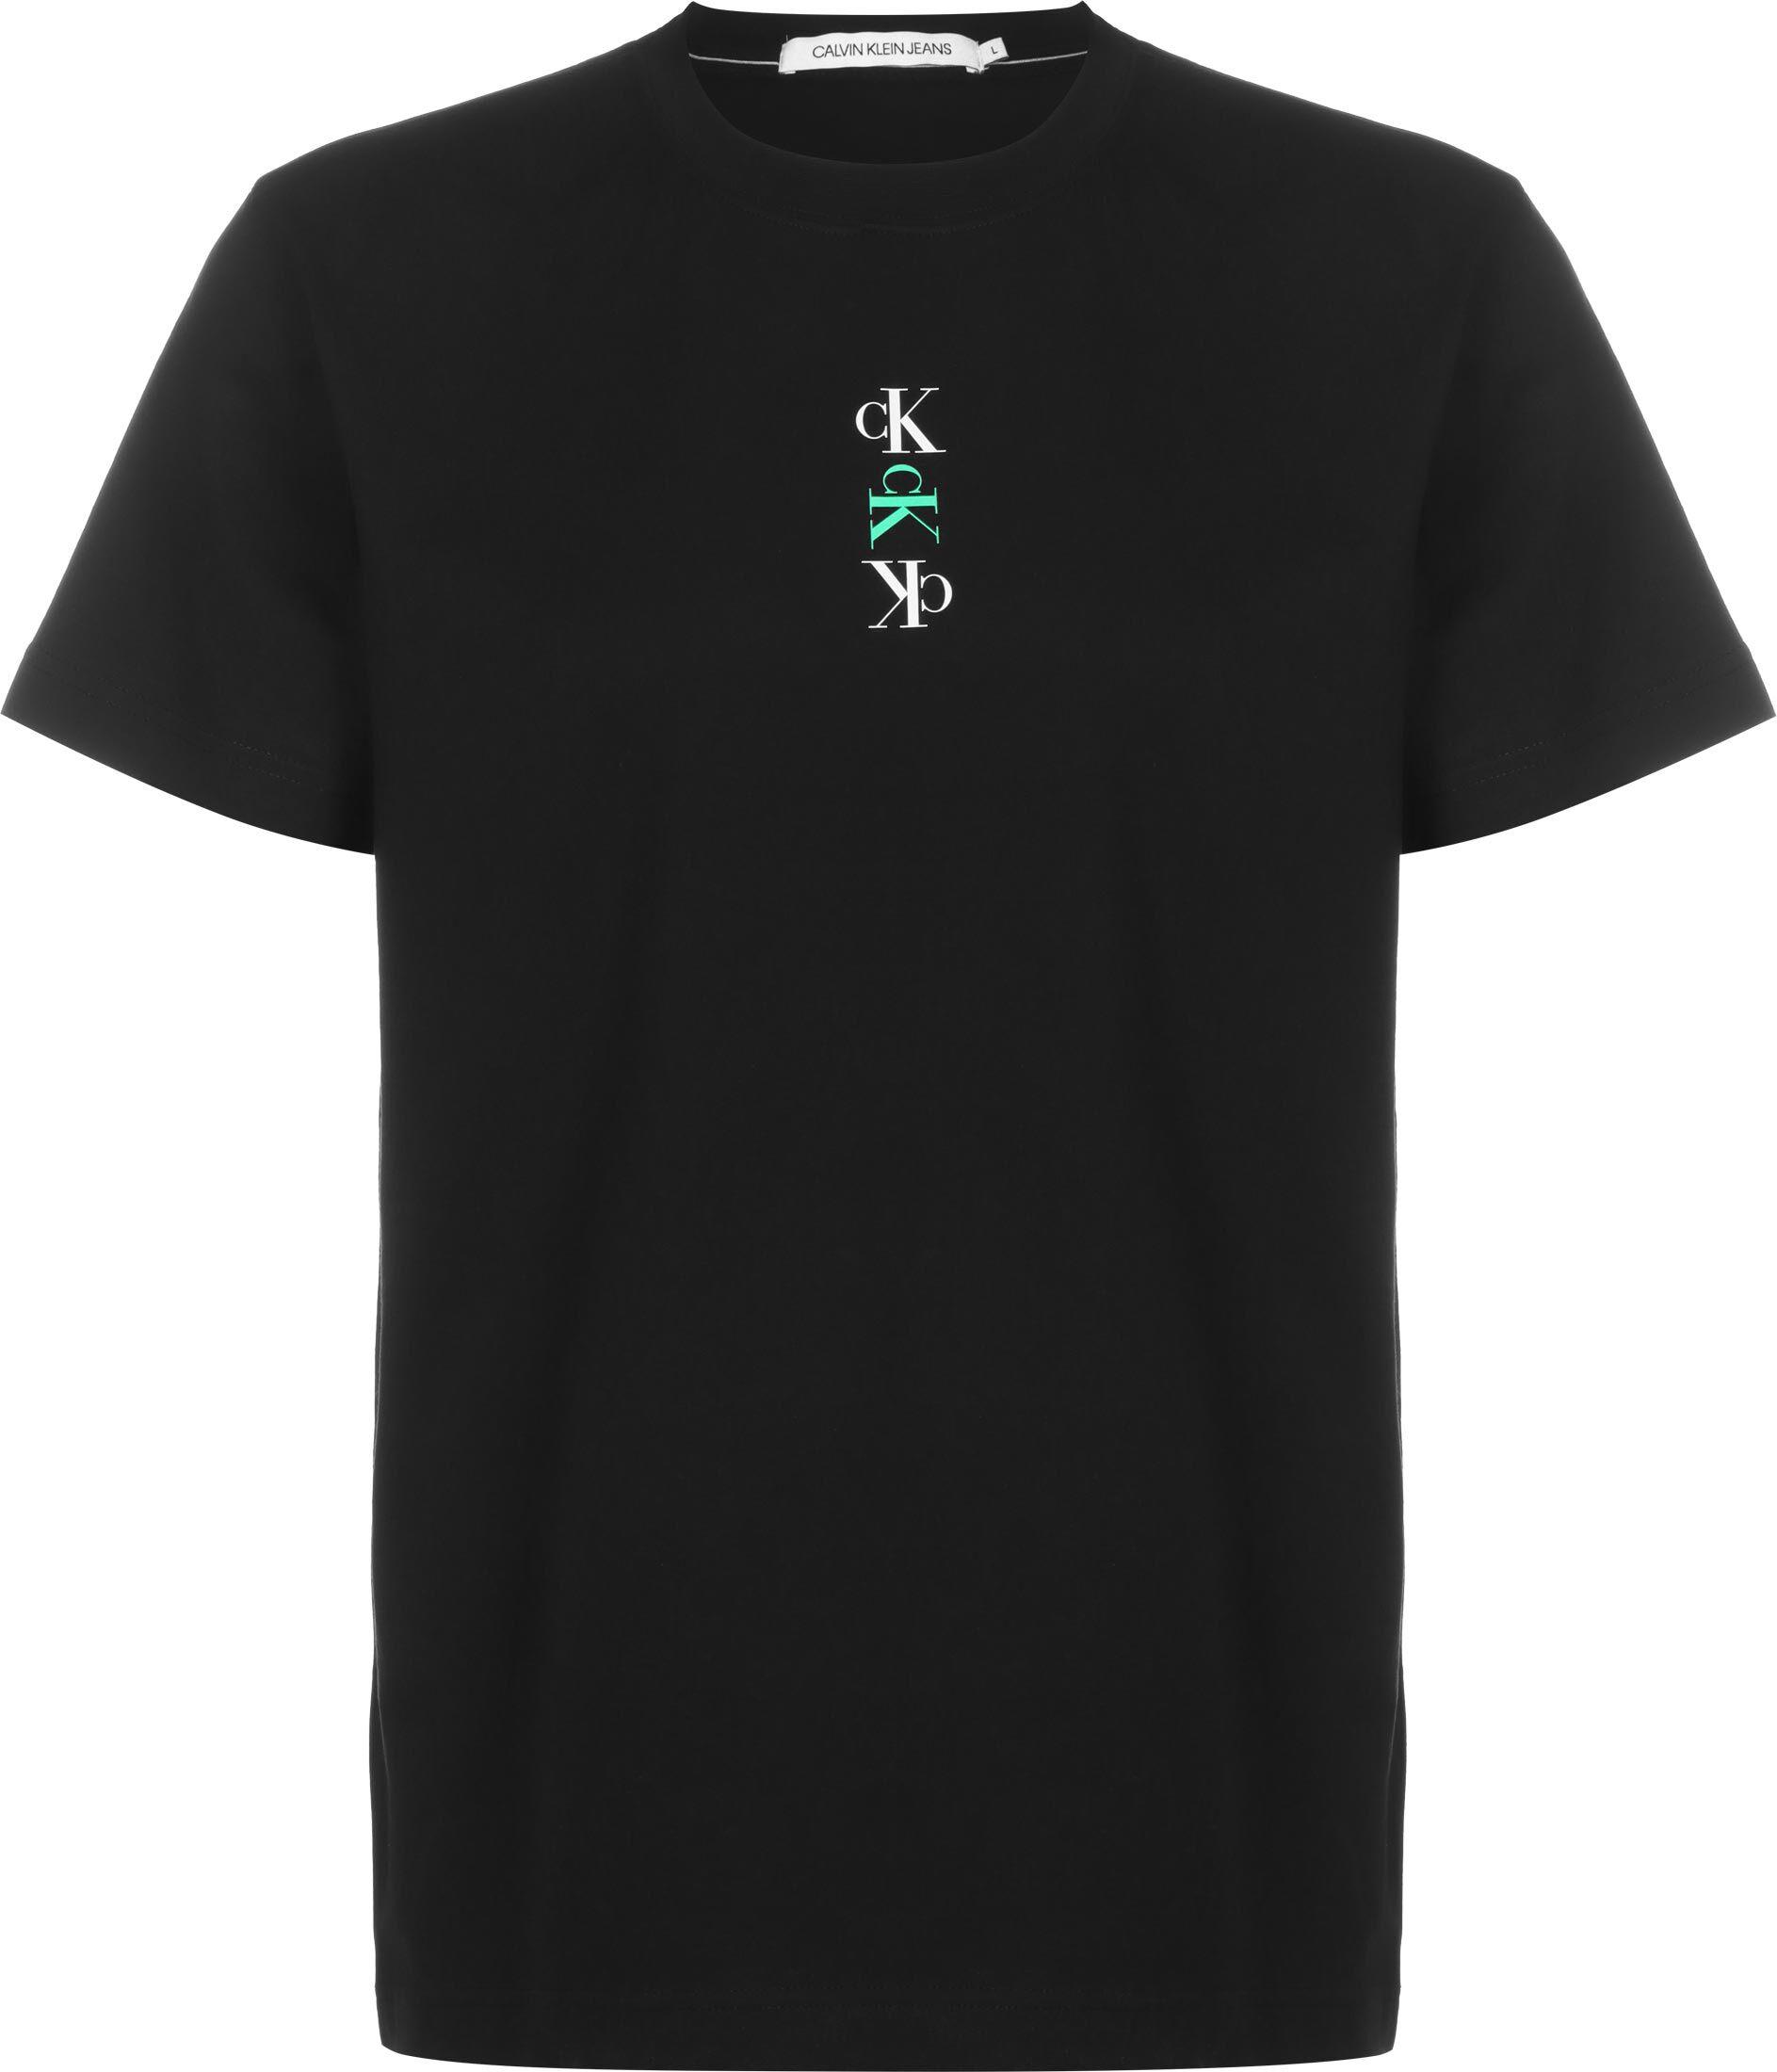 Calvin Klein Jeans Calvin Klein Repeat Graphic Text, taille S, homme, noir